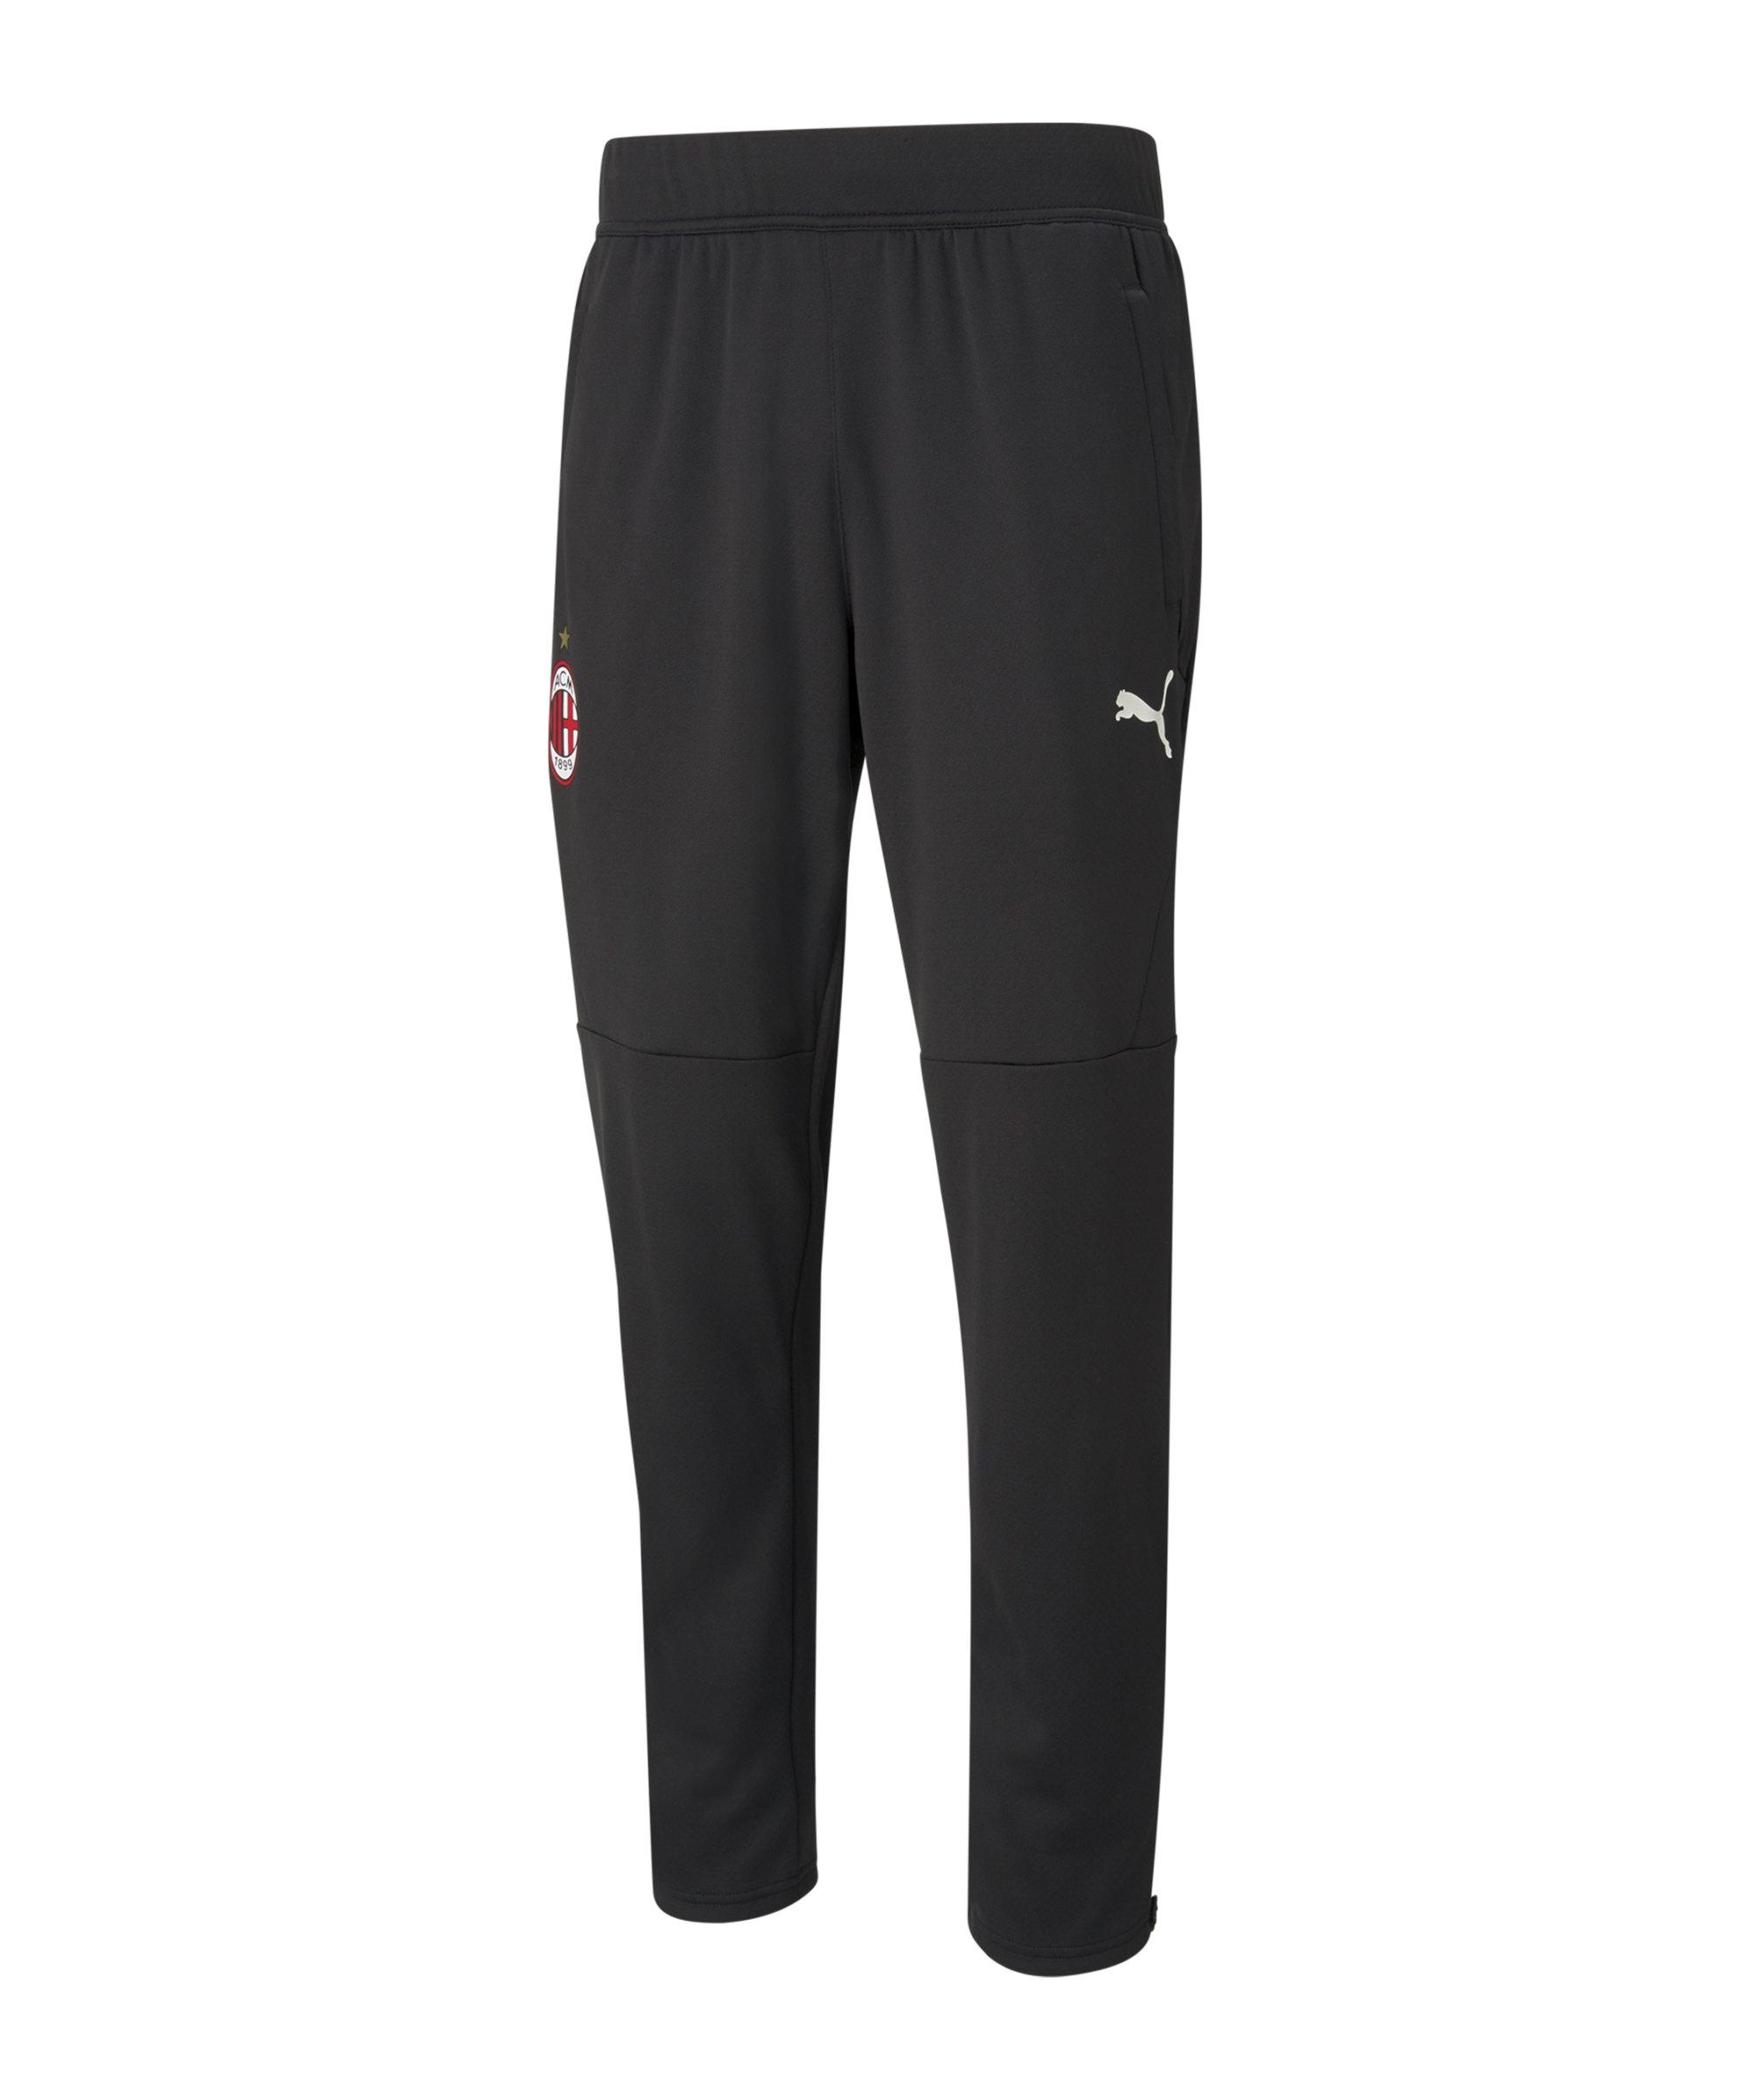 PUMA AC Mailand Warmup Trainingshose F02 - schwarz